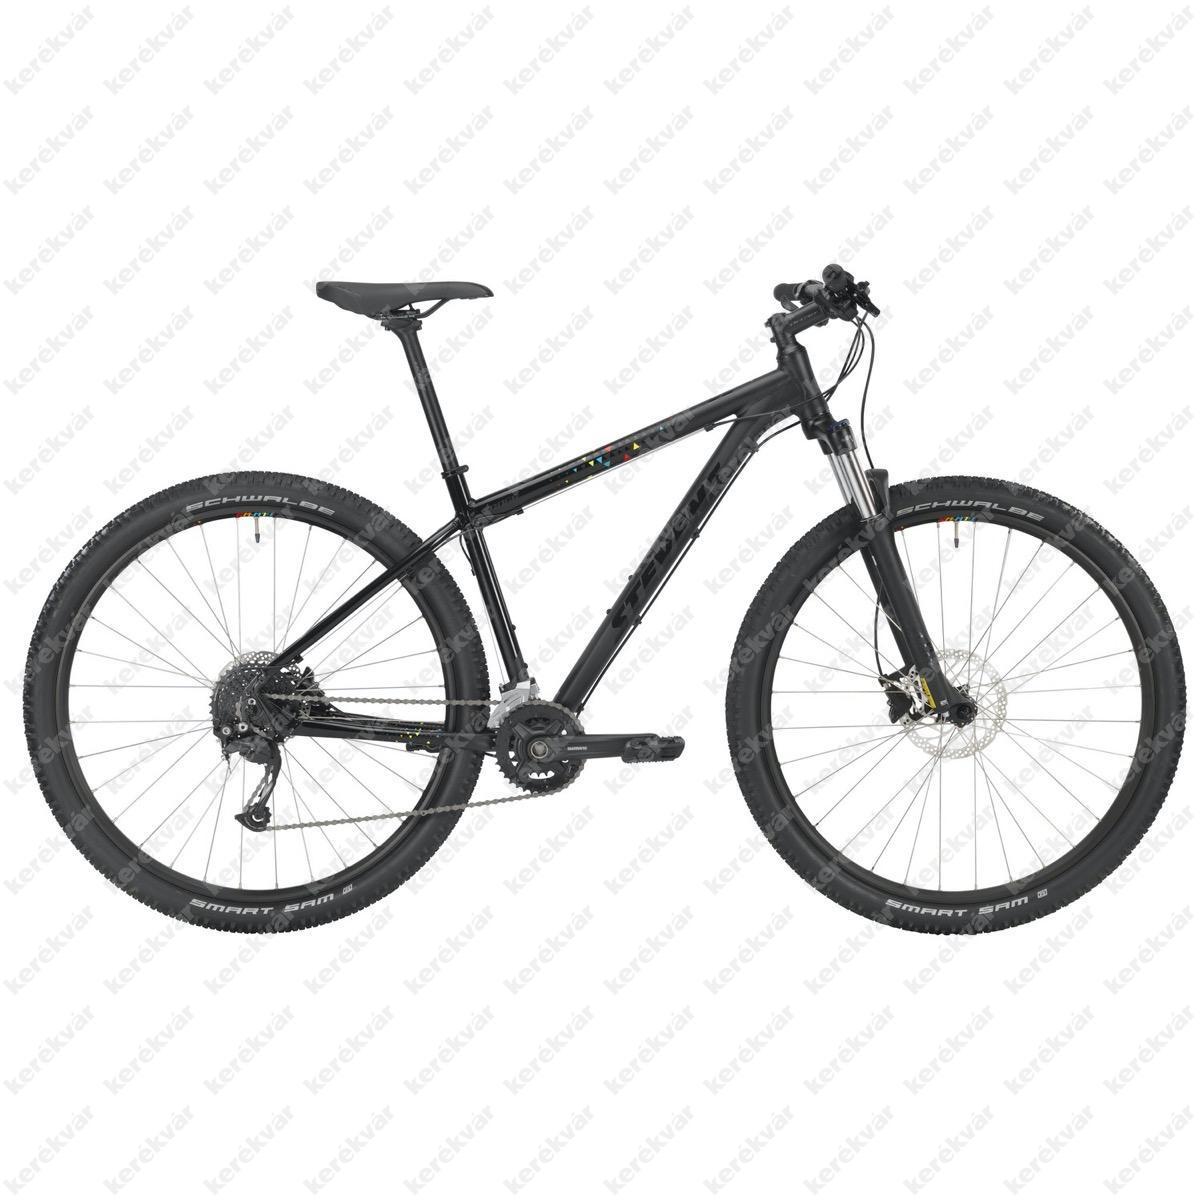 Stevens Tonga bicycle black 2021